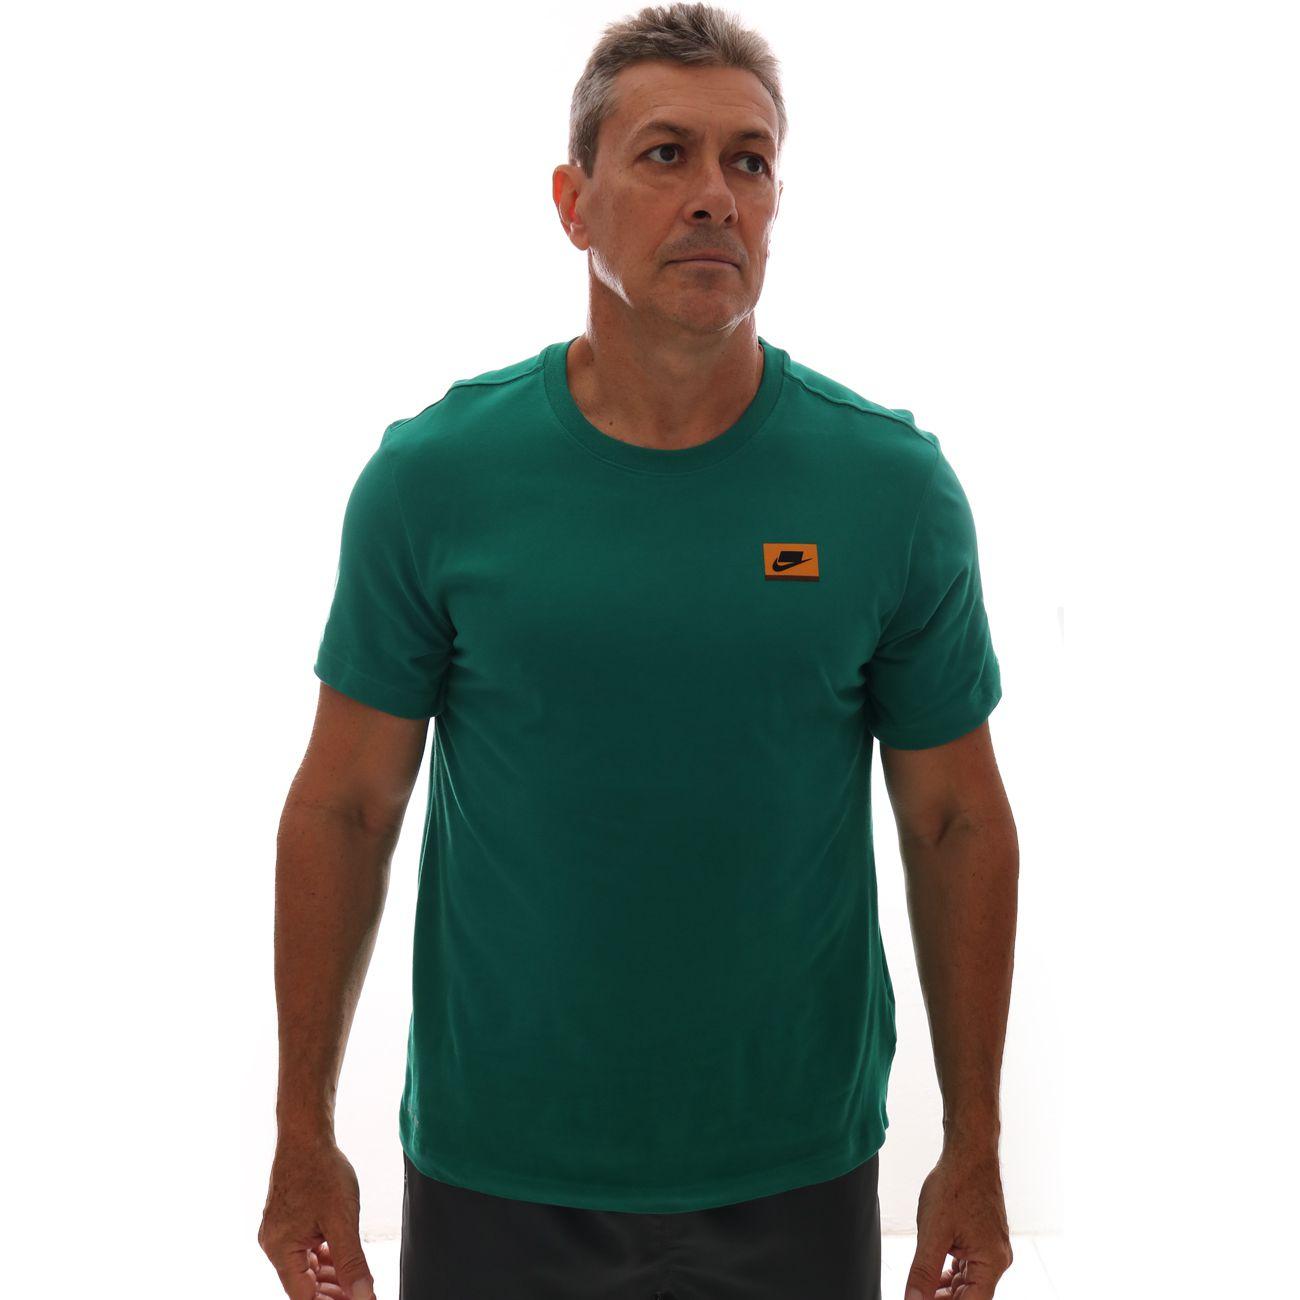 Camiseta Nike Dri-fit Tee Verde